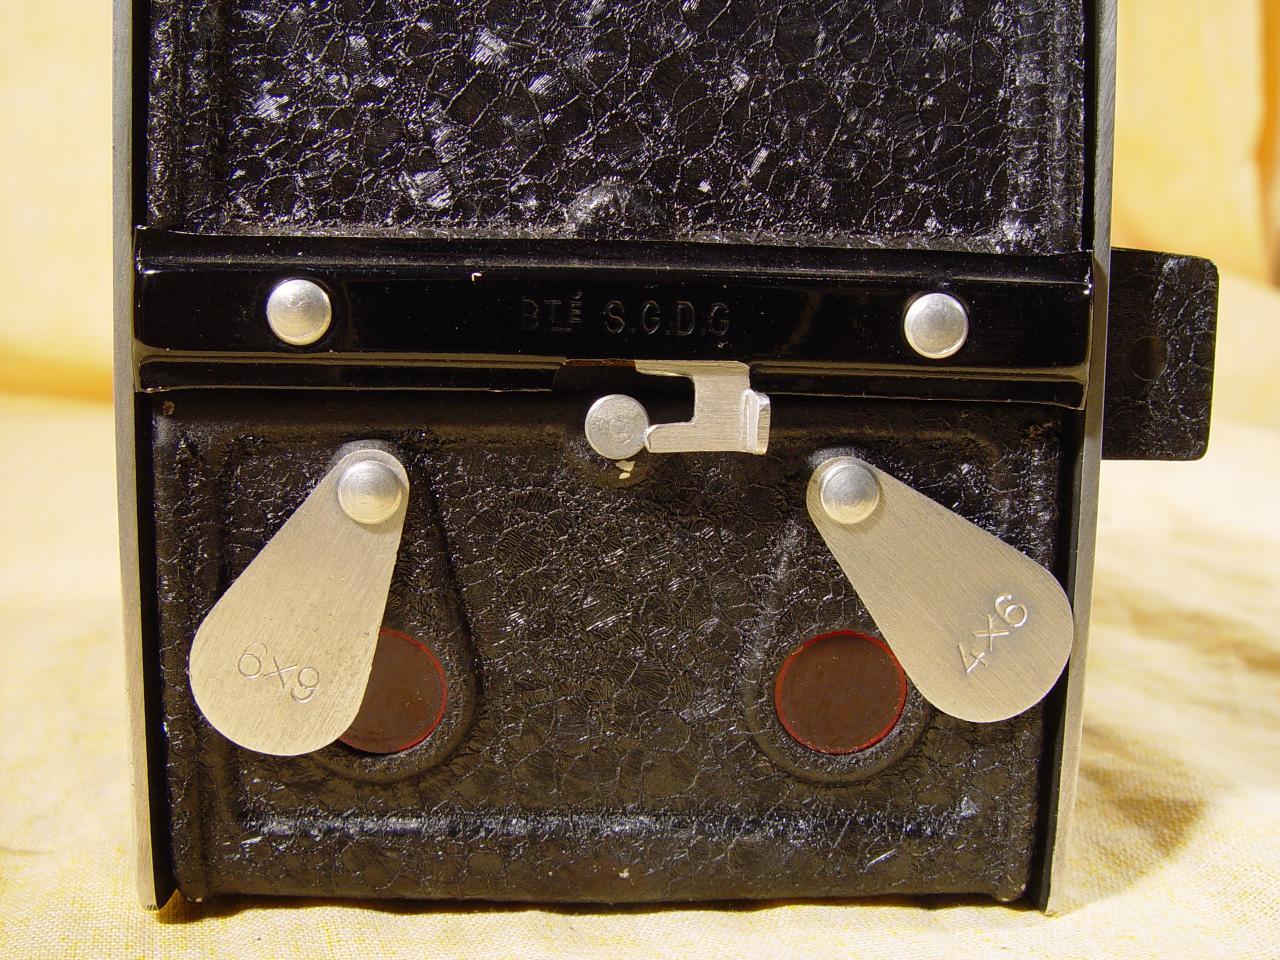 Wallpaper 3033-6 MIDELLY Demilly box modele de base, collection AMI Appareils photos